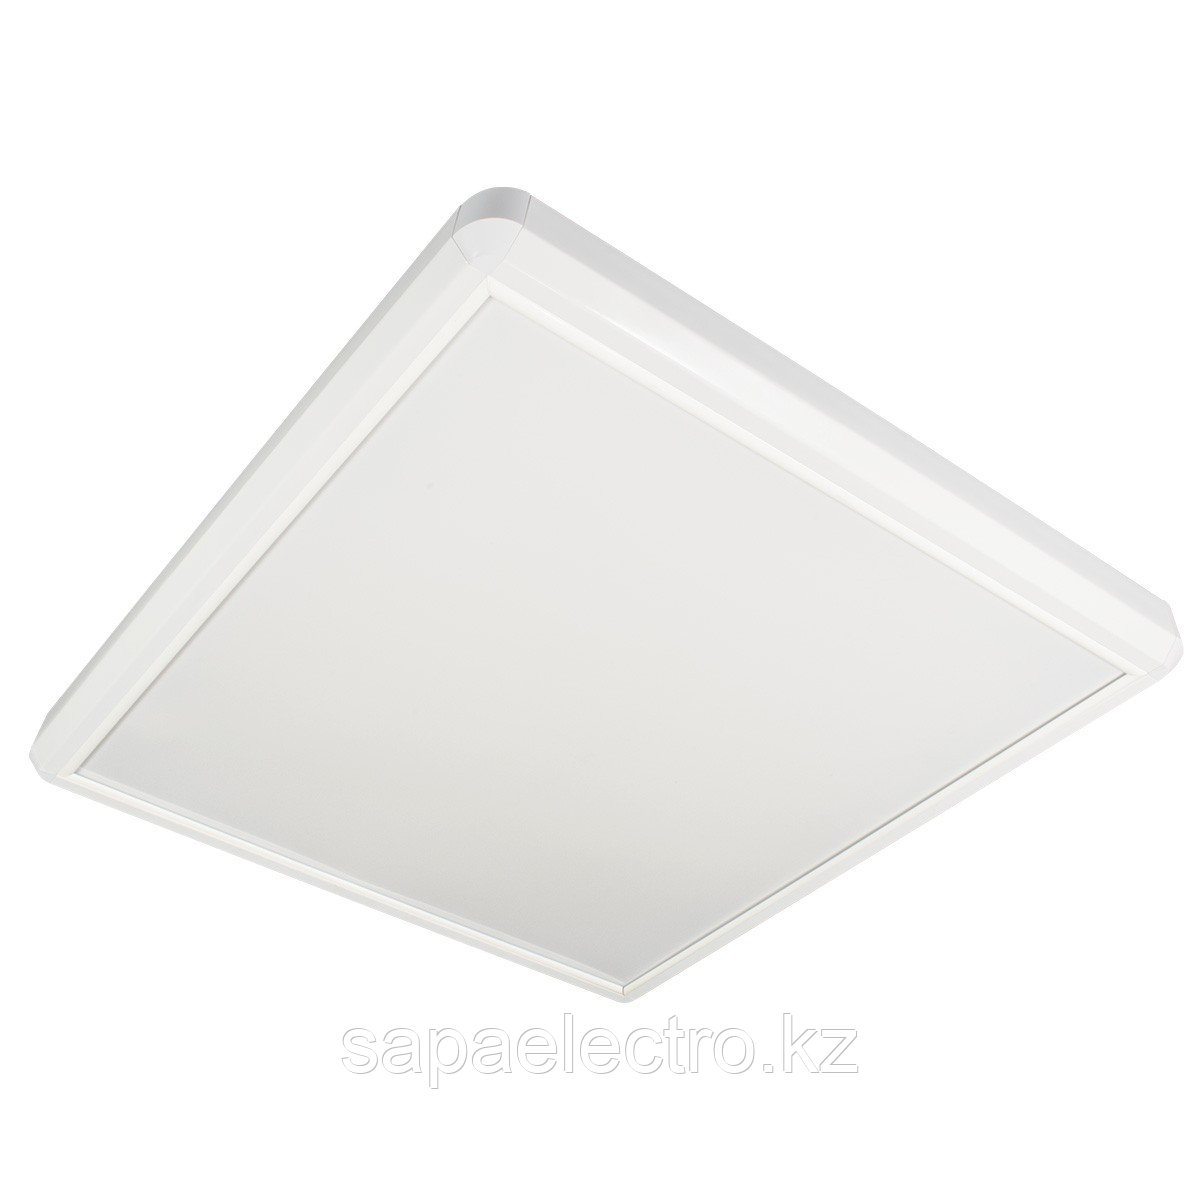 Св-к LZN 4X18W S/U DETAY OPAL  ELECTR MEGALUX (TS)